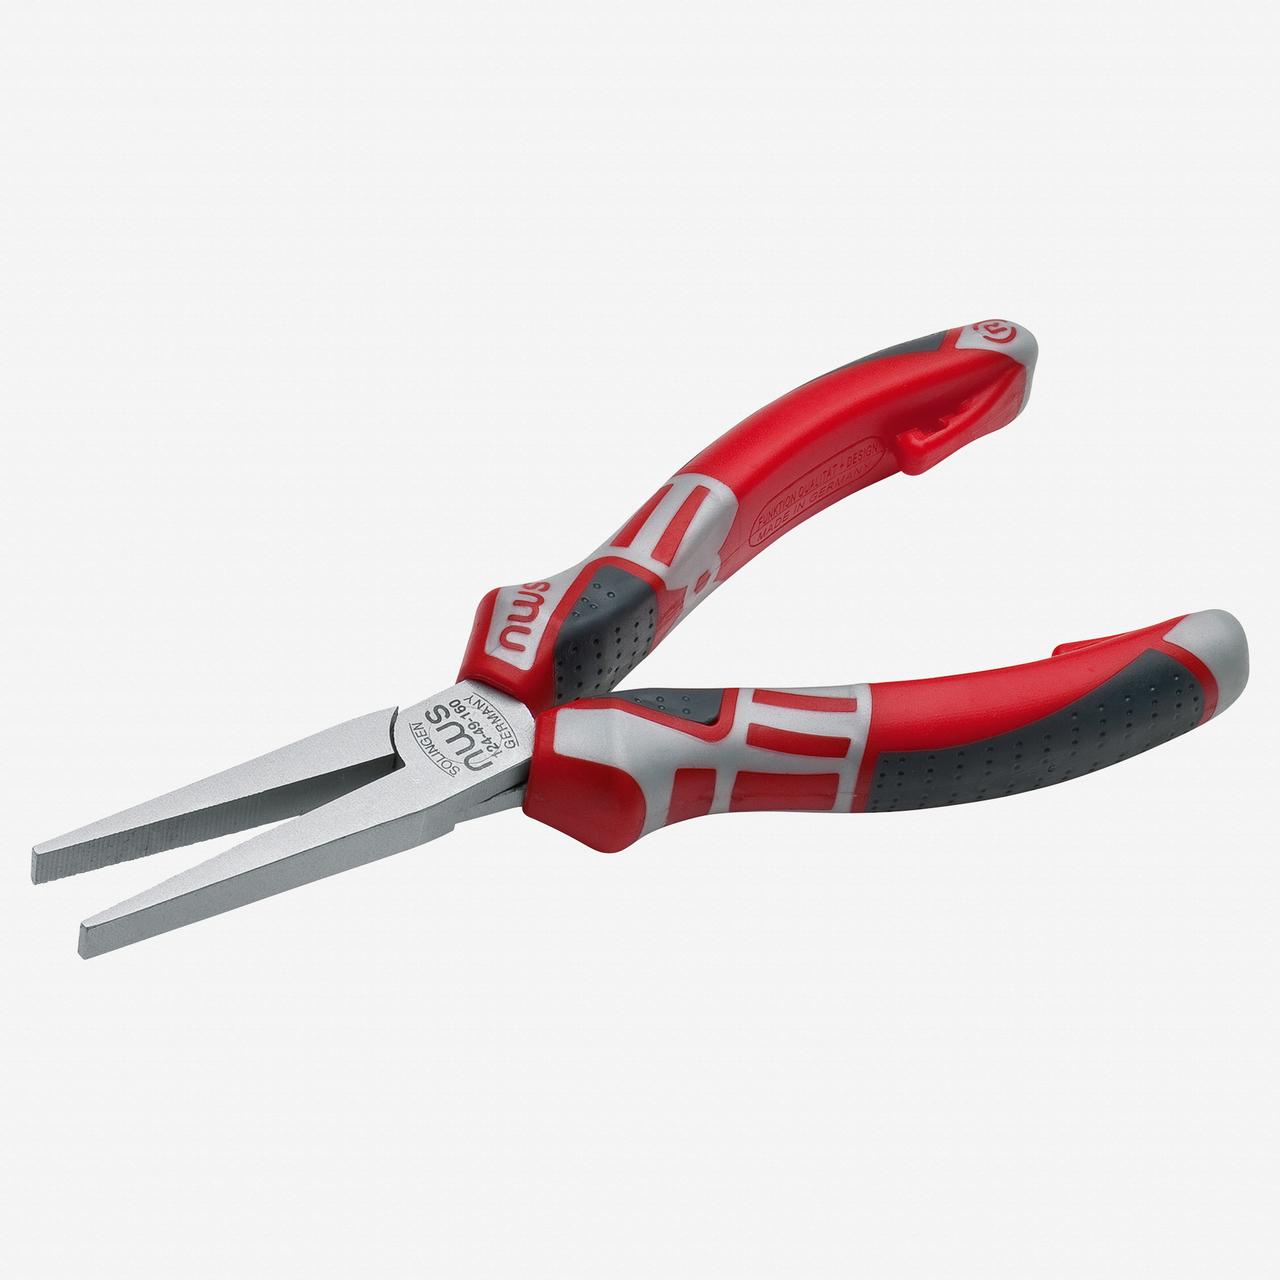 "NWS 124-49-160 6.25"" Long Flat Nose Pliers - Matte Chromium - SoftGripp - KC Tool"